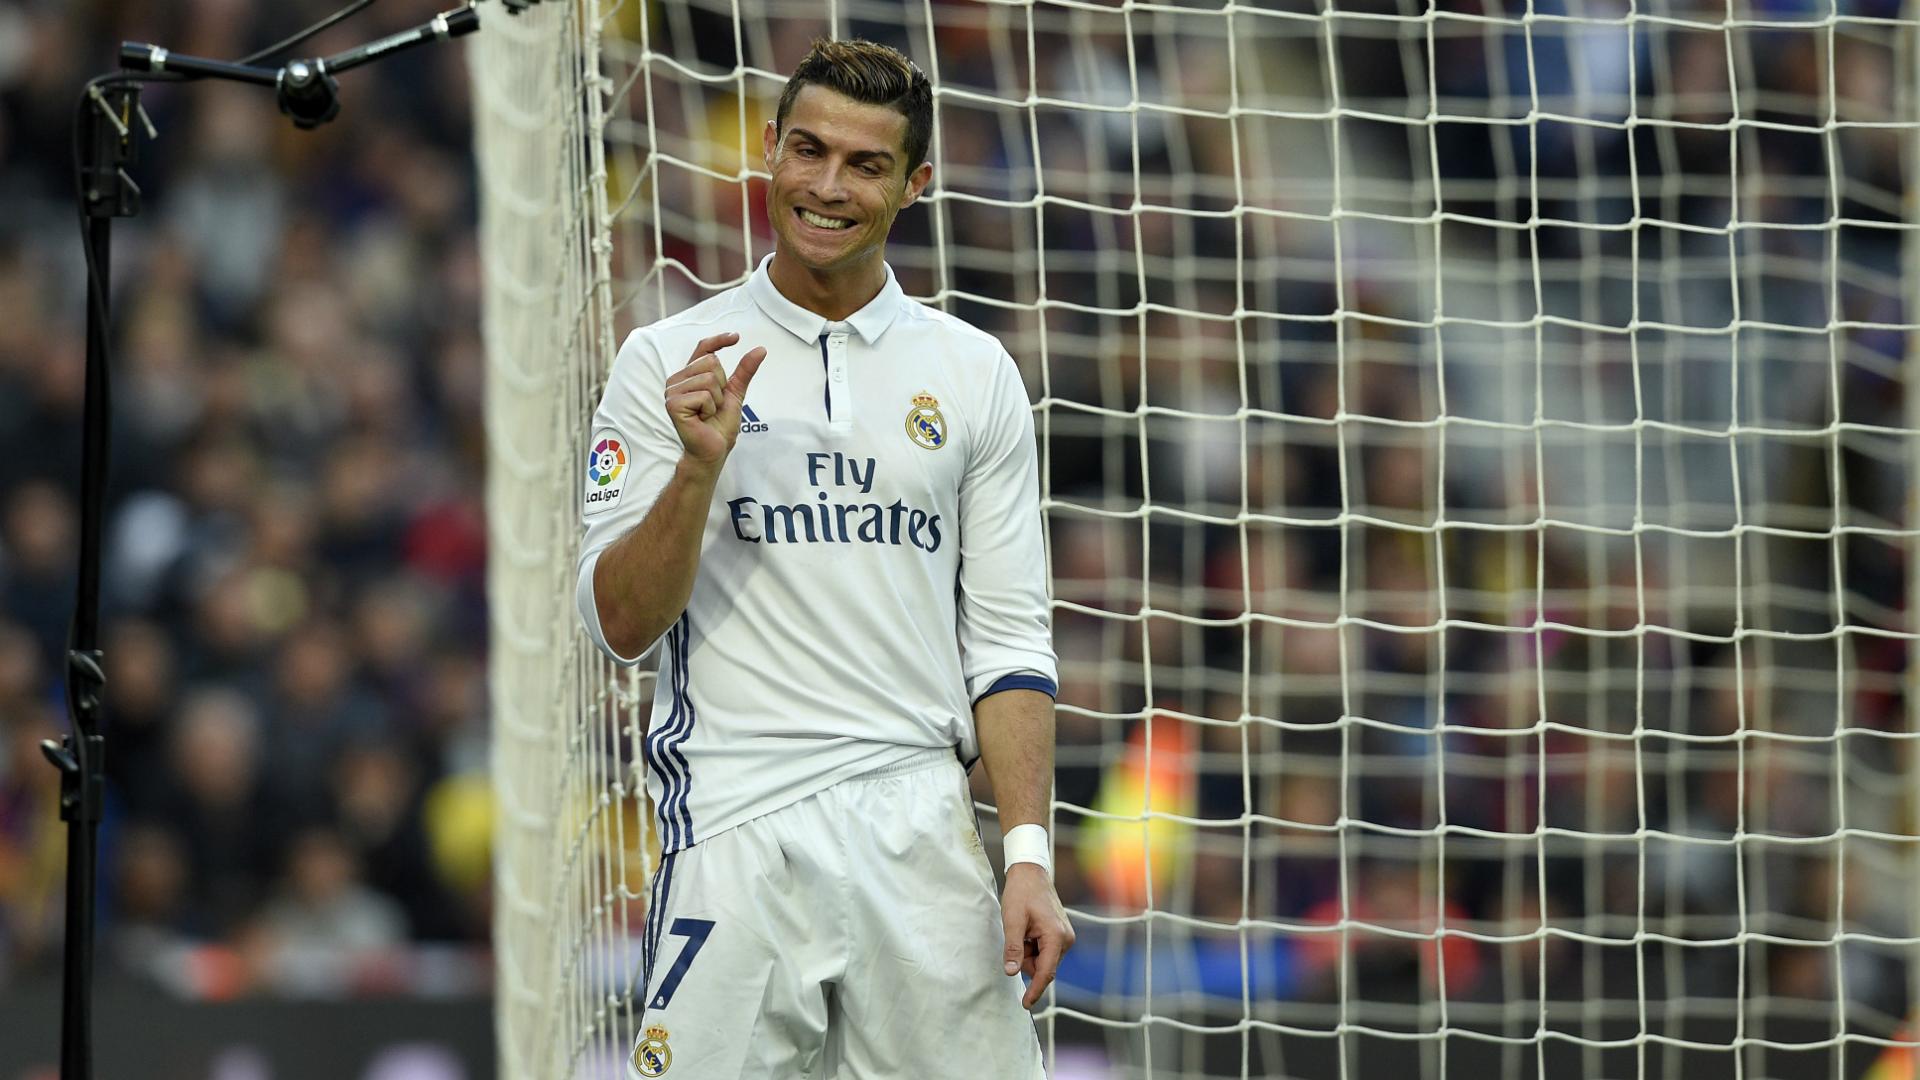 Cristiano Ronaldo faces imprisonment for non-payment of taxes 31.07.2017 54